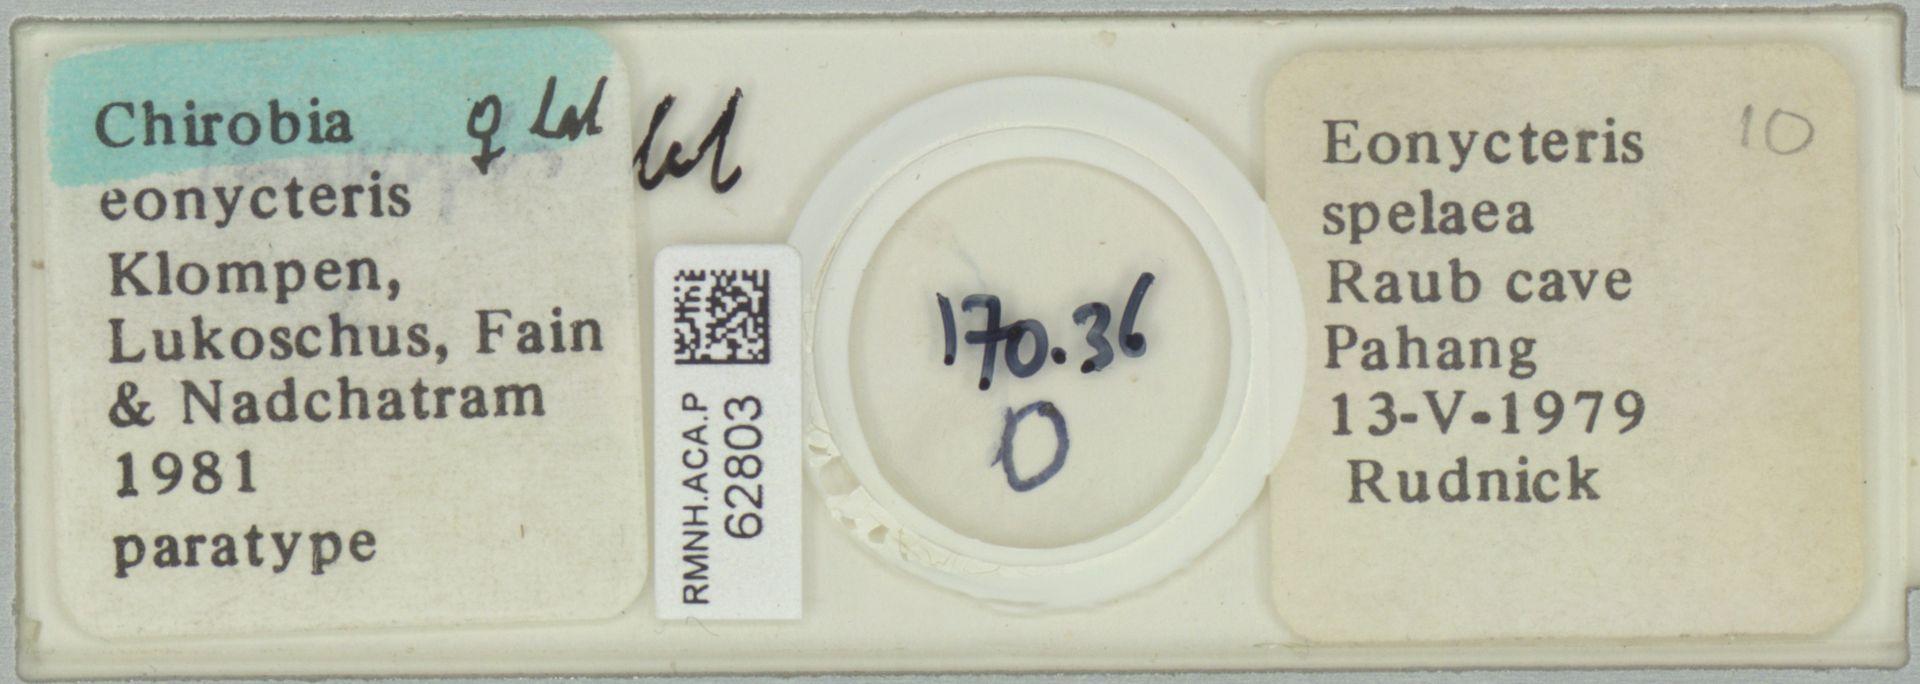 RMNH.ACA.P.62803   Chirobia eonycteris Klompen, Lukoschus, Fain & Nadchatram, 1981